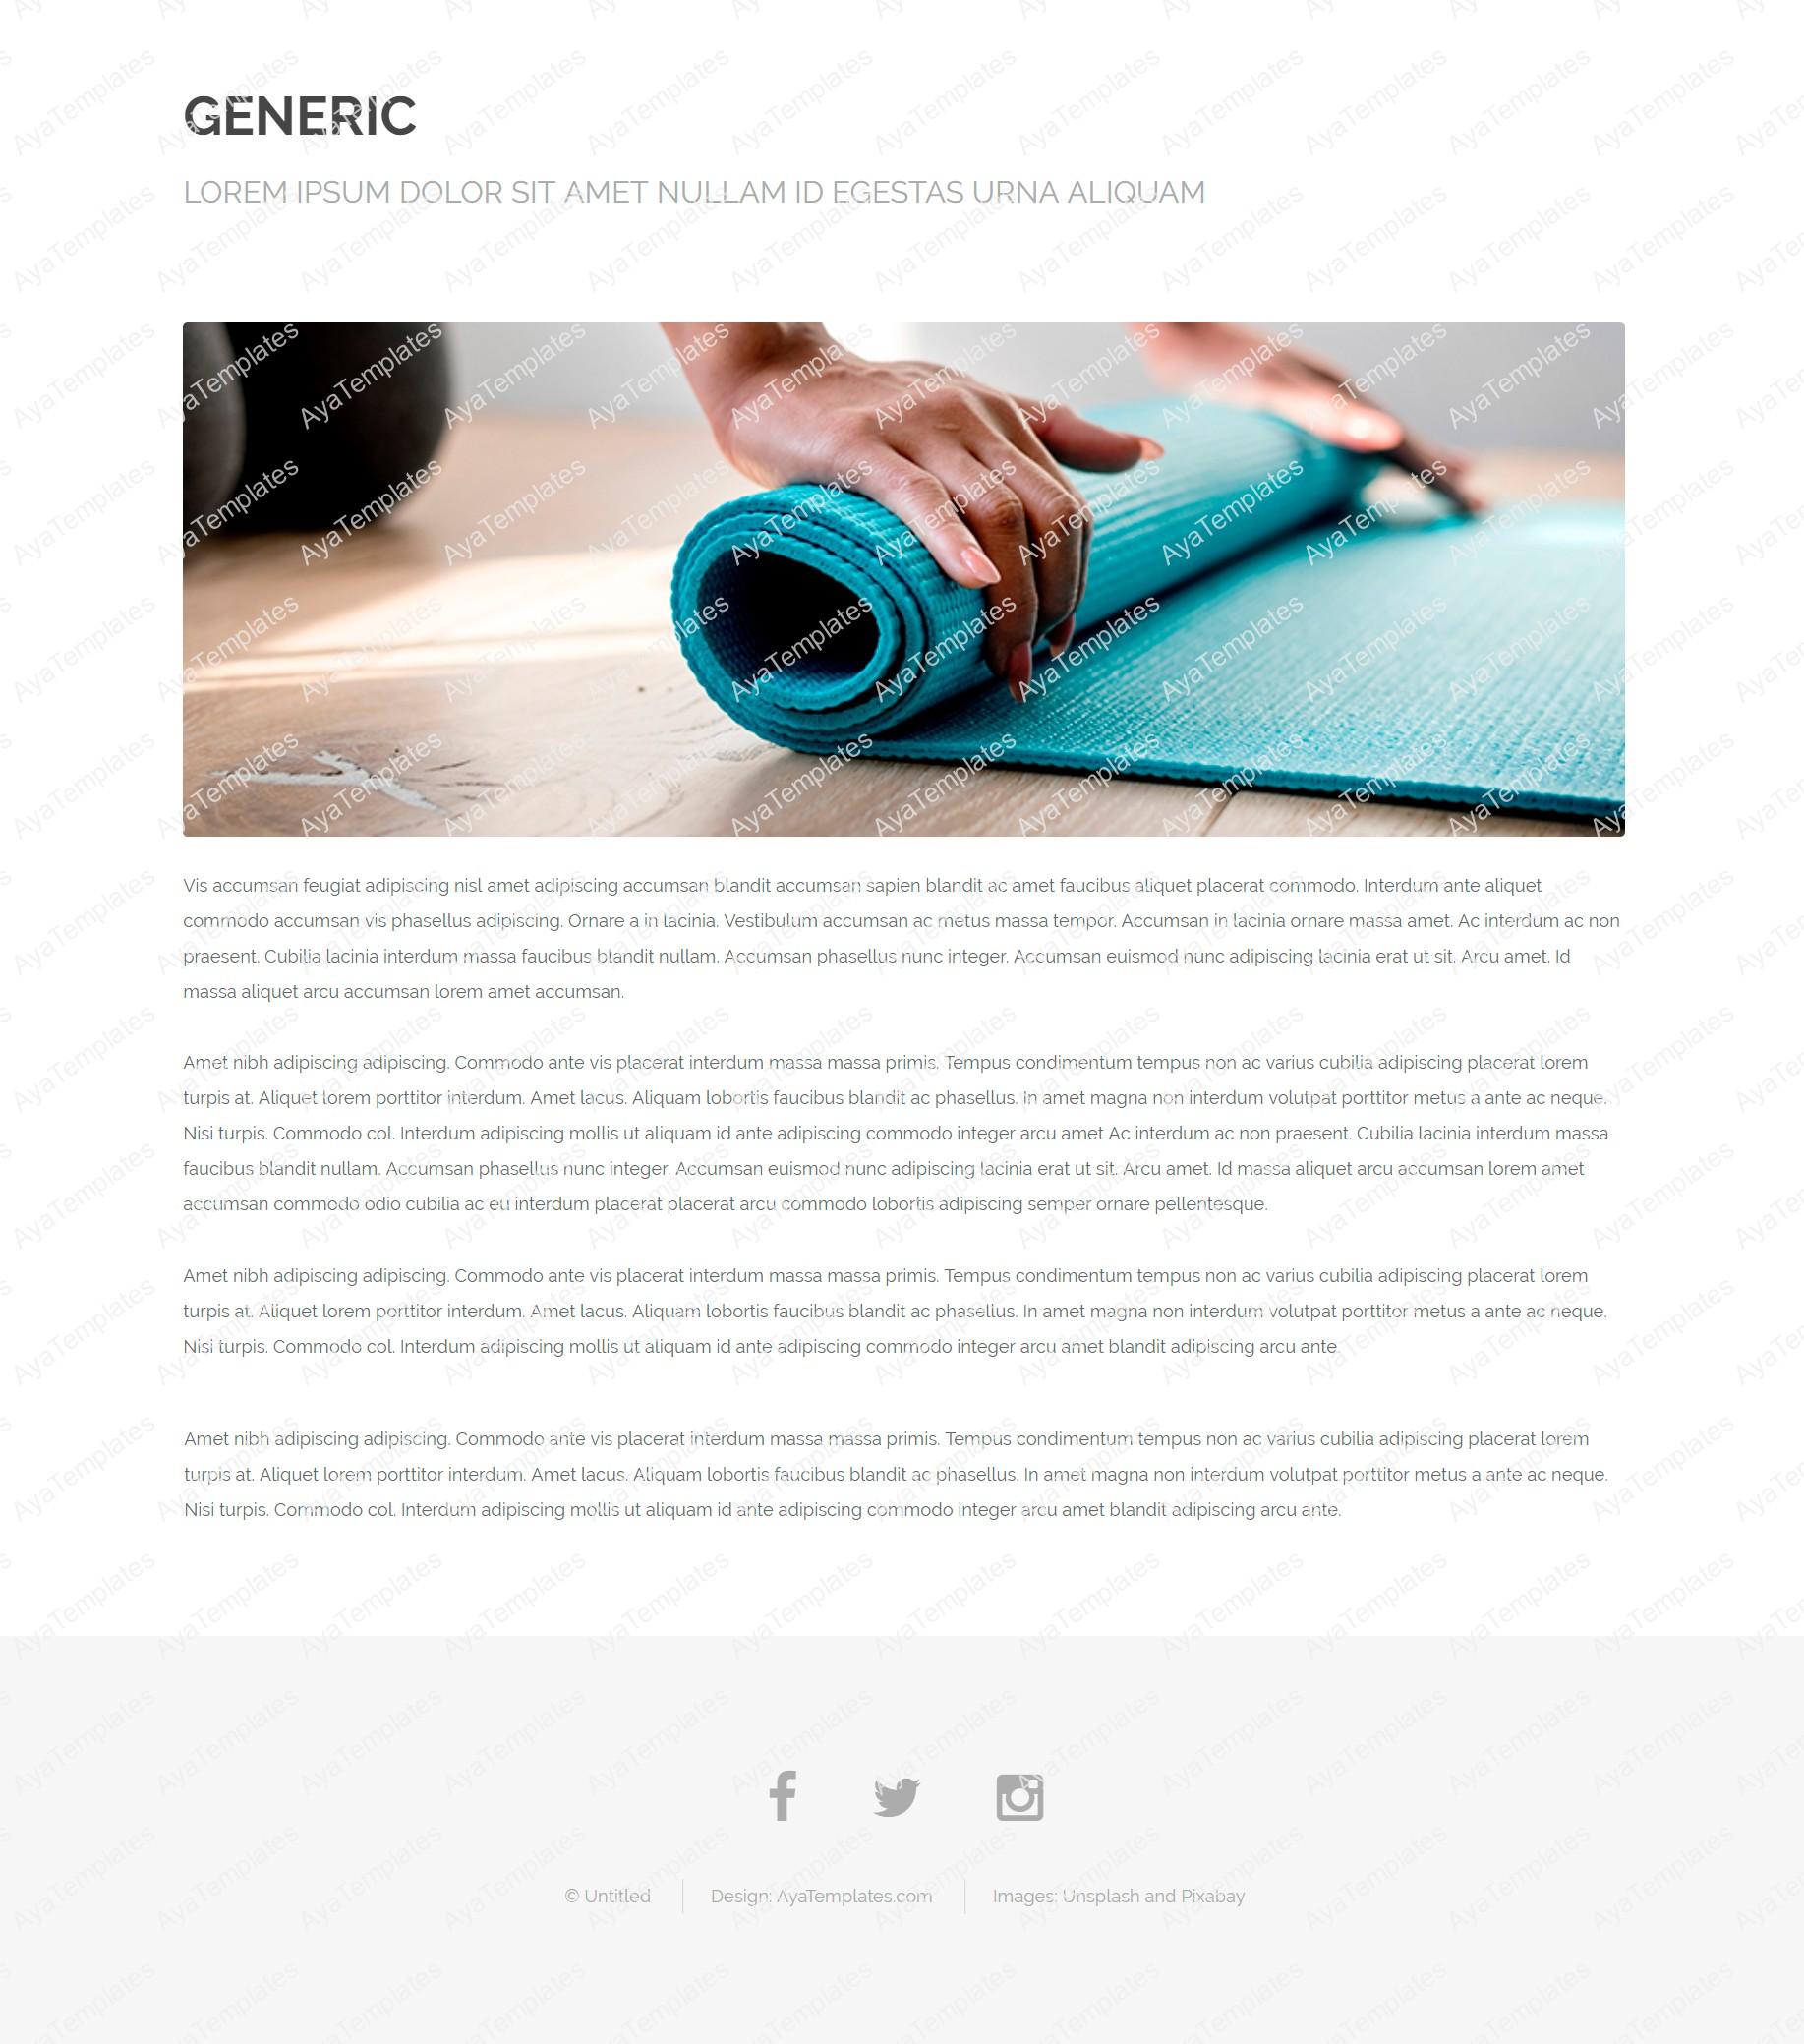 ayafitnessclub-css-designed-site-content-generic-page